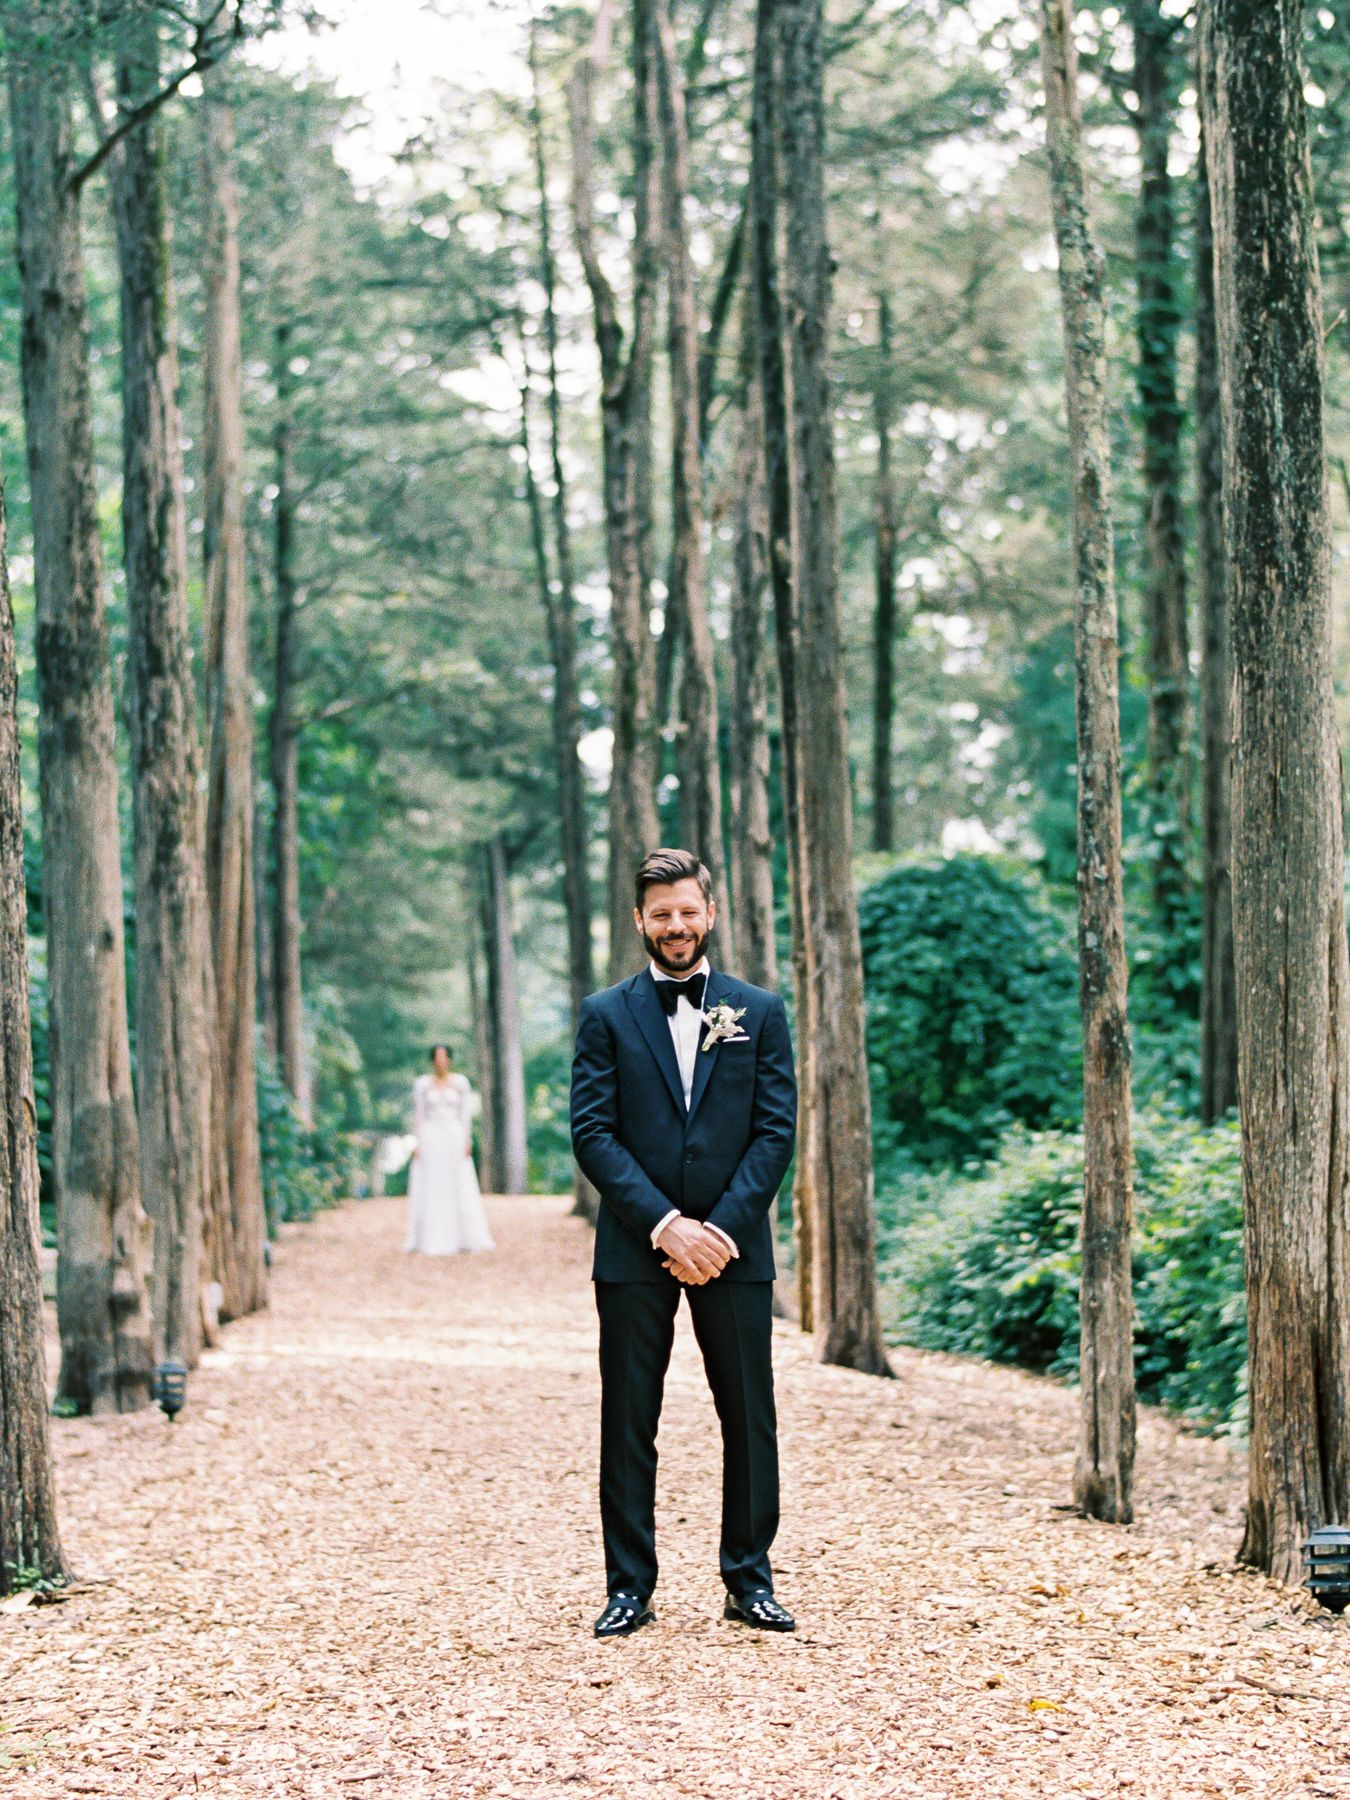 Enchanting NYC wedding in a sunken garden with a brass